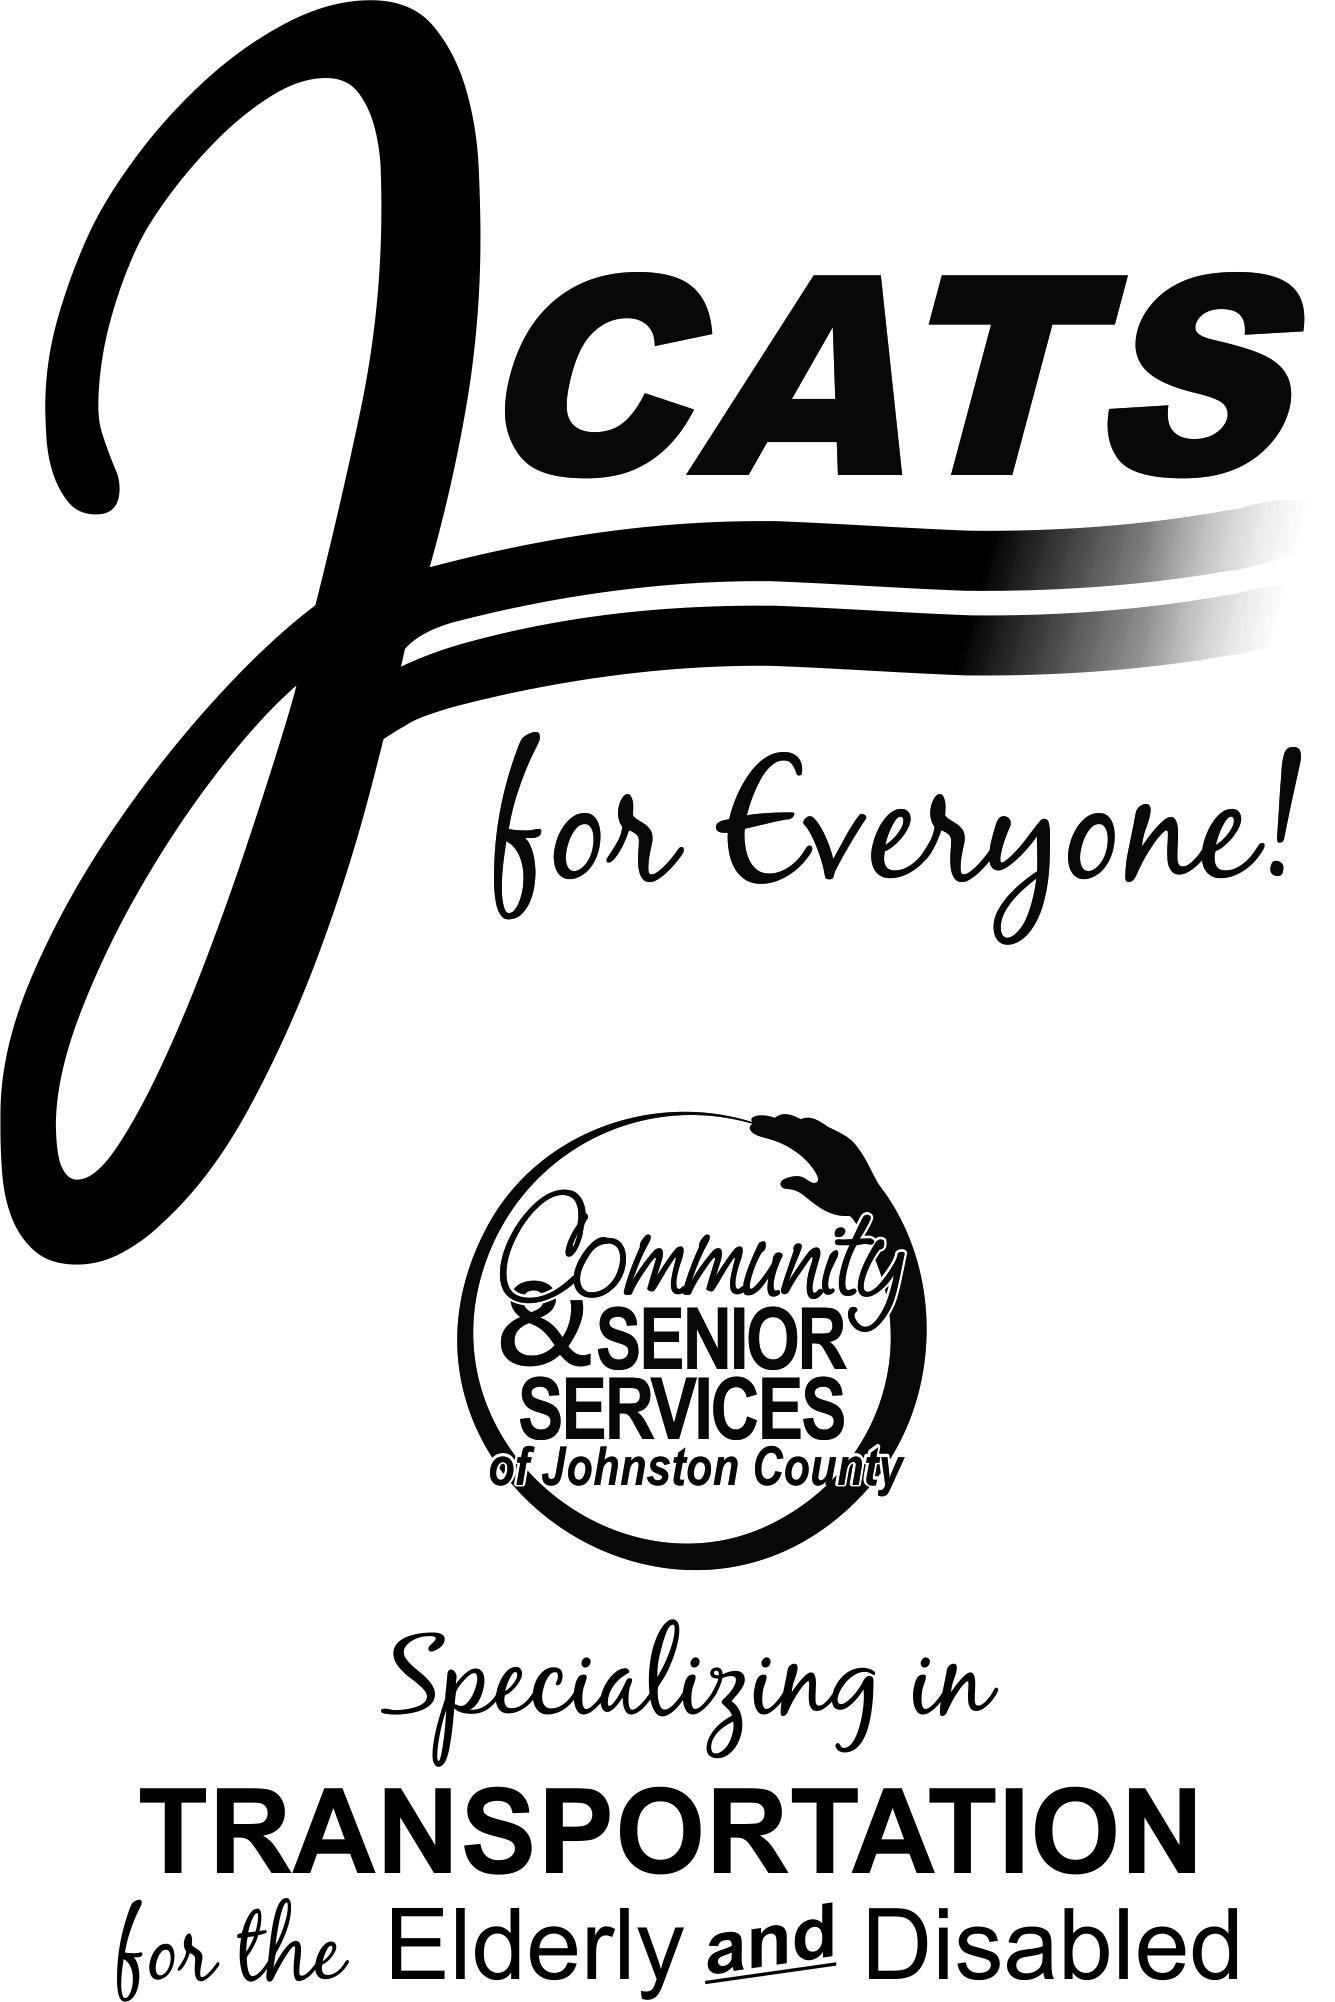 Sponsor JCATS